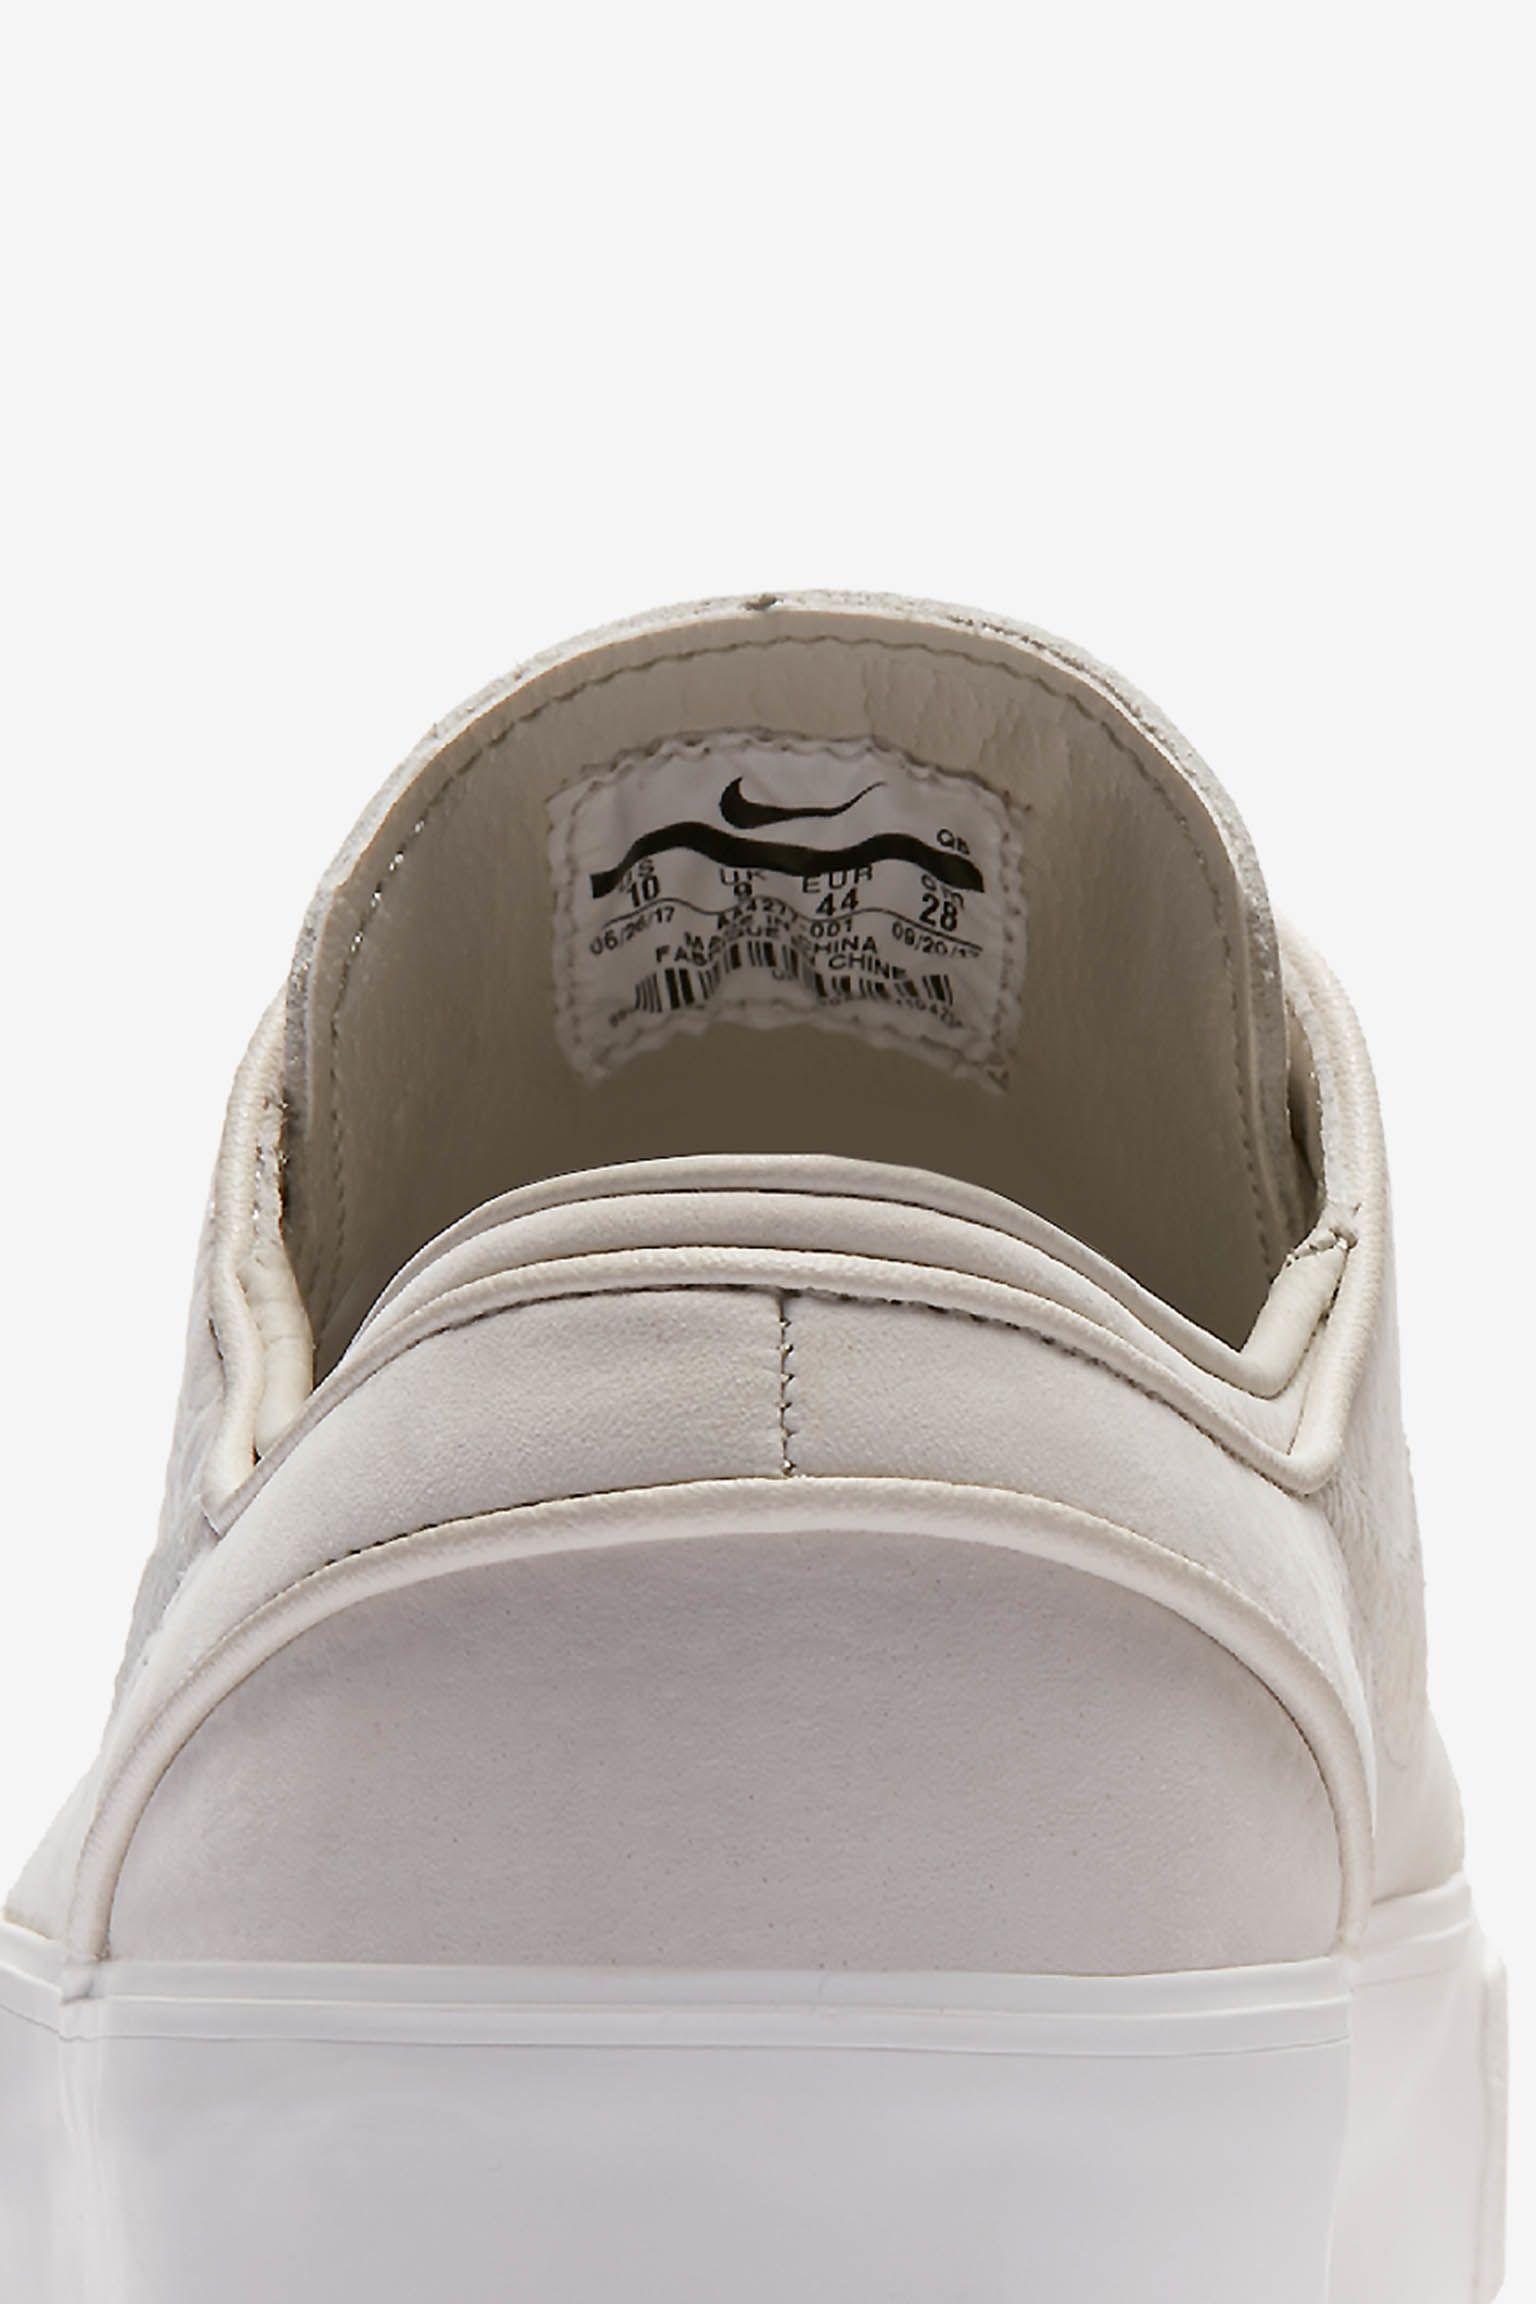 Nike SB Janoski Decon 'Light Bone & Summit White' 发布日期